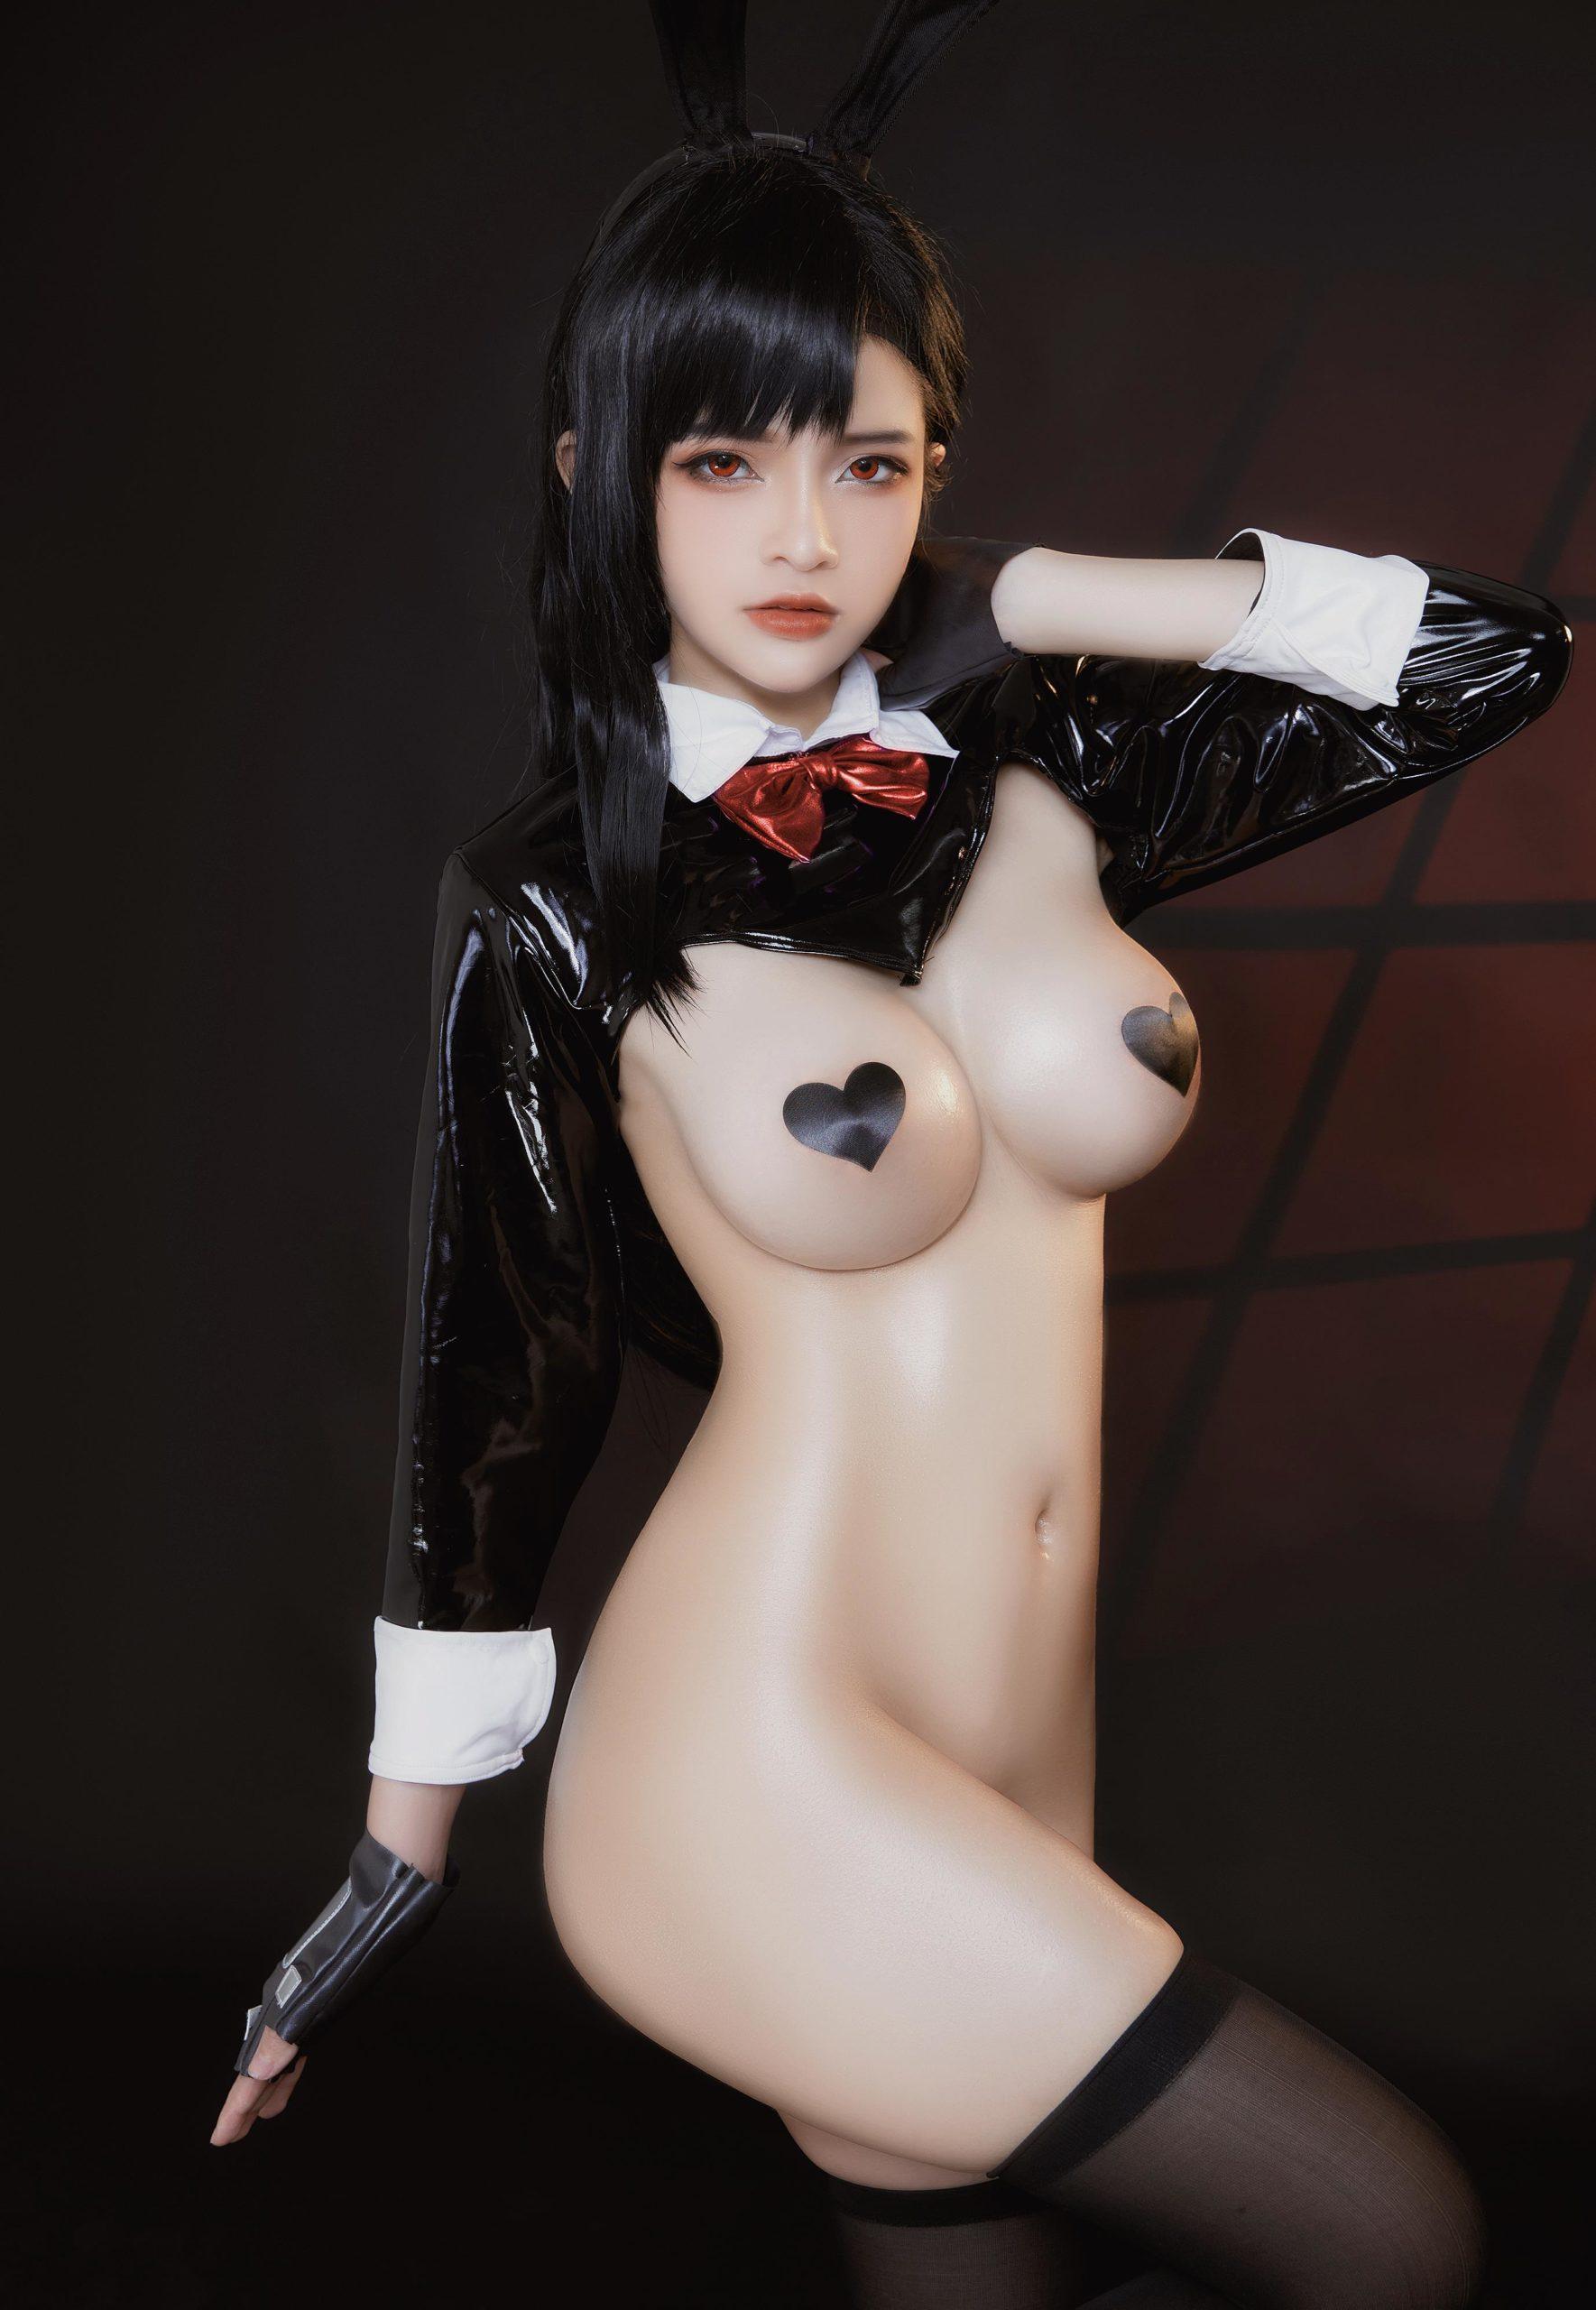 TifaLockhart Bunny Girl EroCosplay by Azami 5